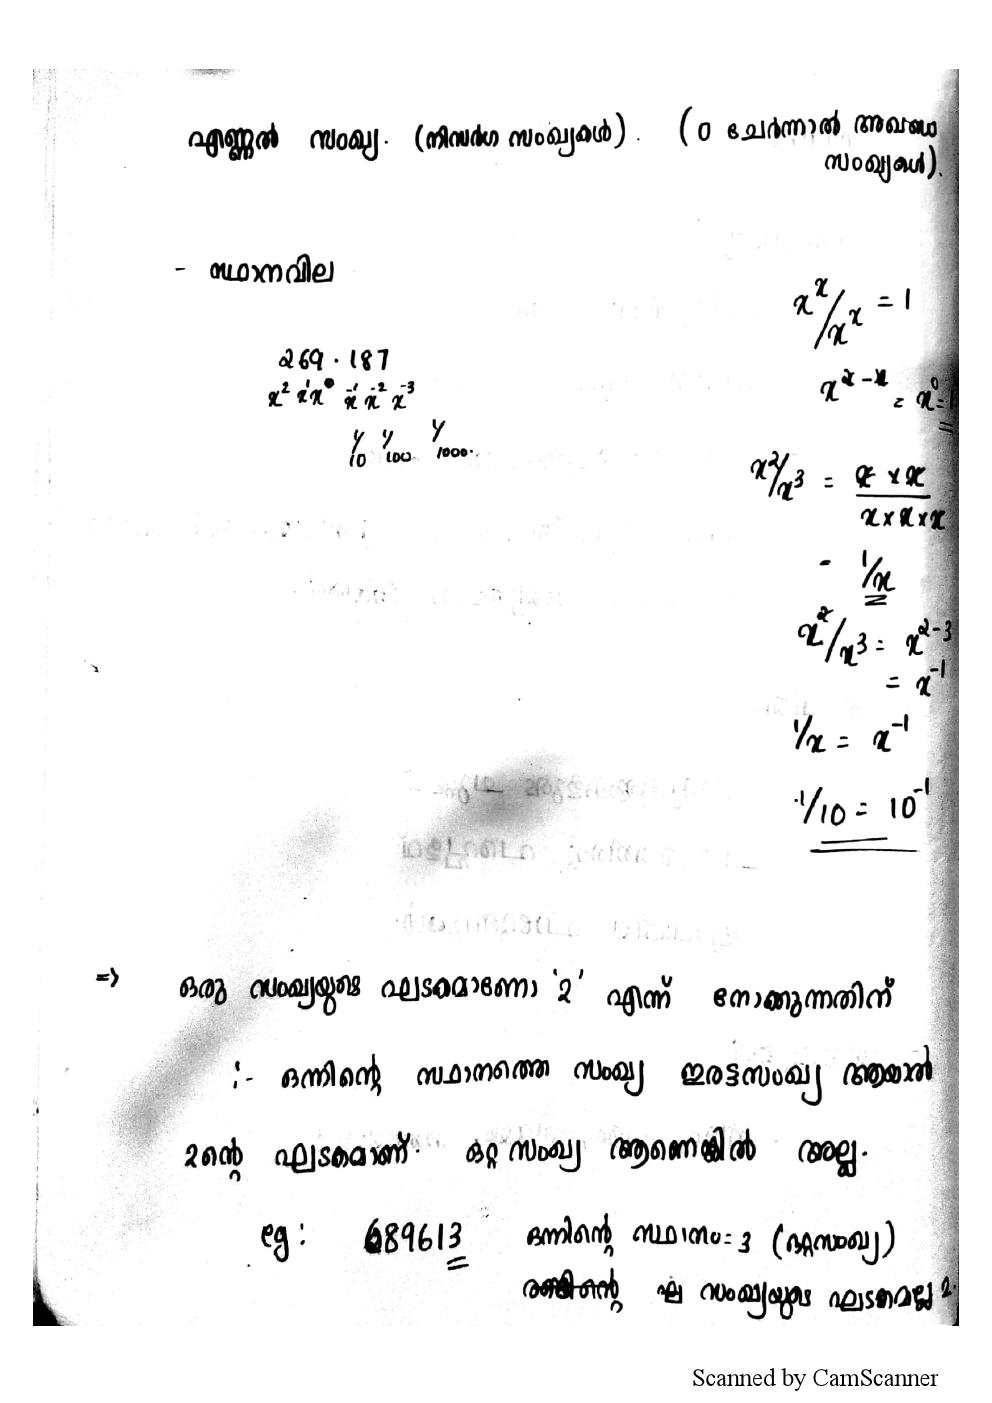 http://masterstudy.net/pdf/ktet_notes0010.png